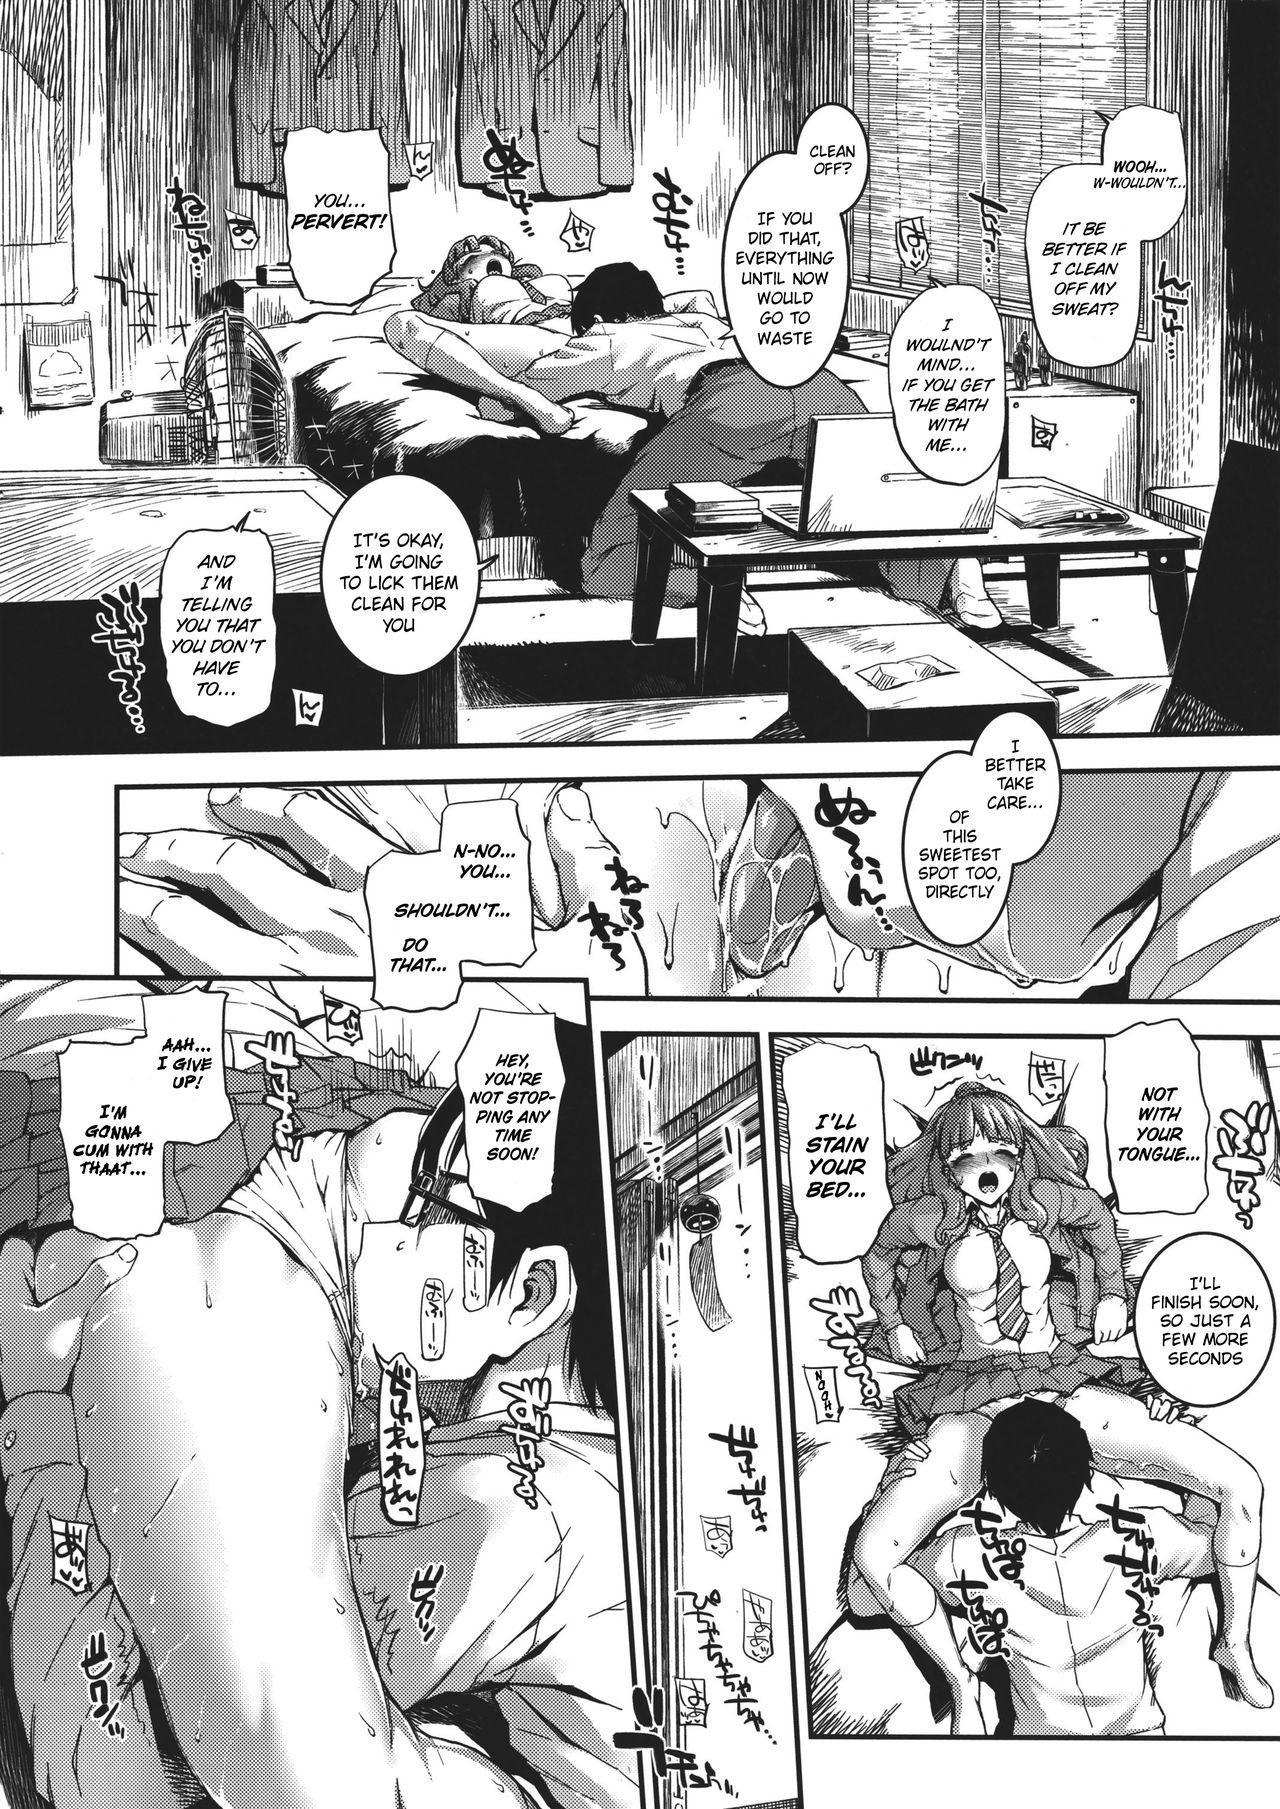 (COMIC1☆10) [Morimiyakan (Morimiya Masayuki)] Sarani, Nao-chan to Asedaku de Suru Hon | The getting all sweaty with Nao-chan book (THE IDOLM@STER CINDERELLA GIRLS) [English] 6